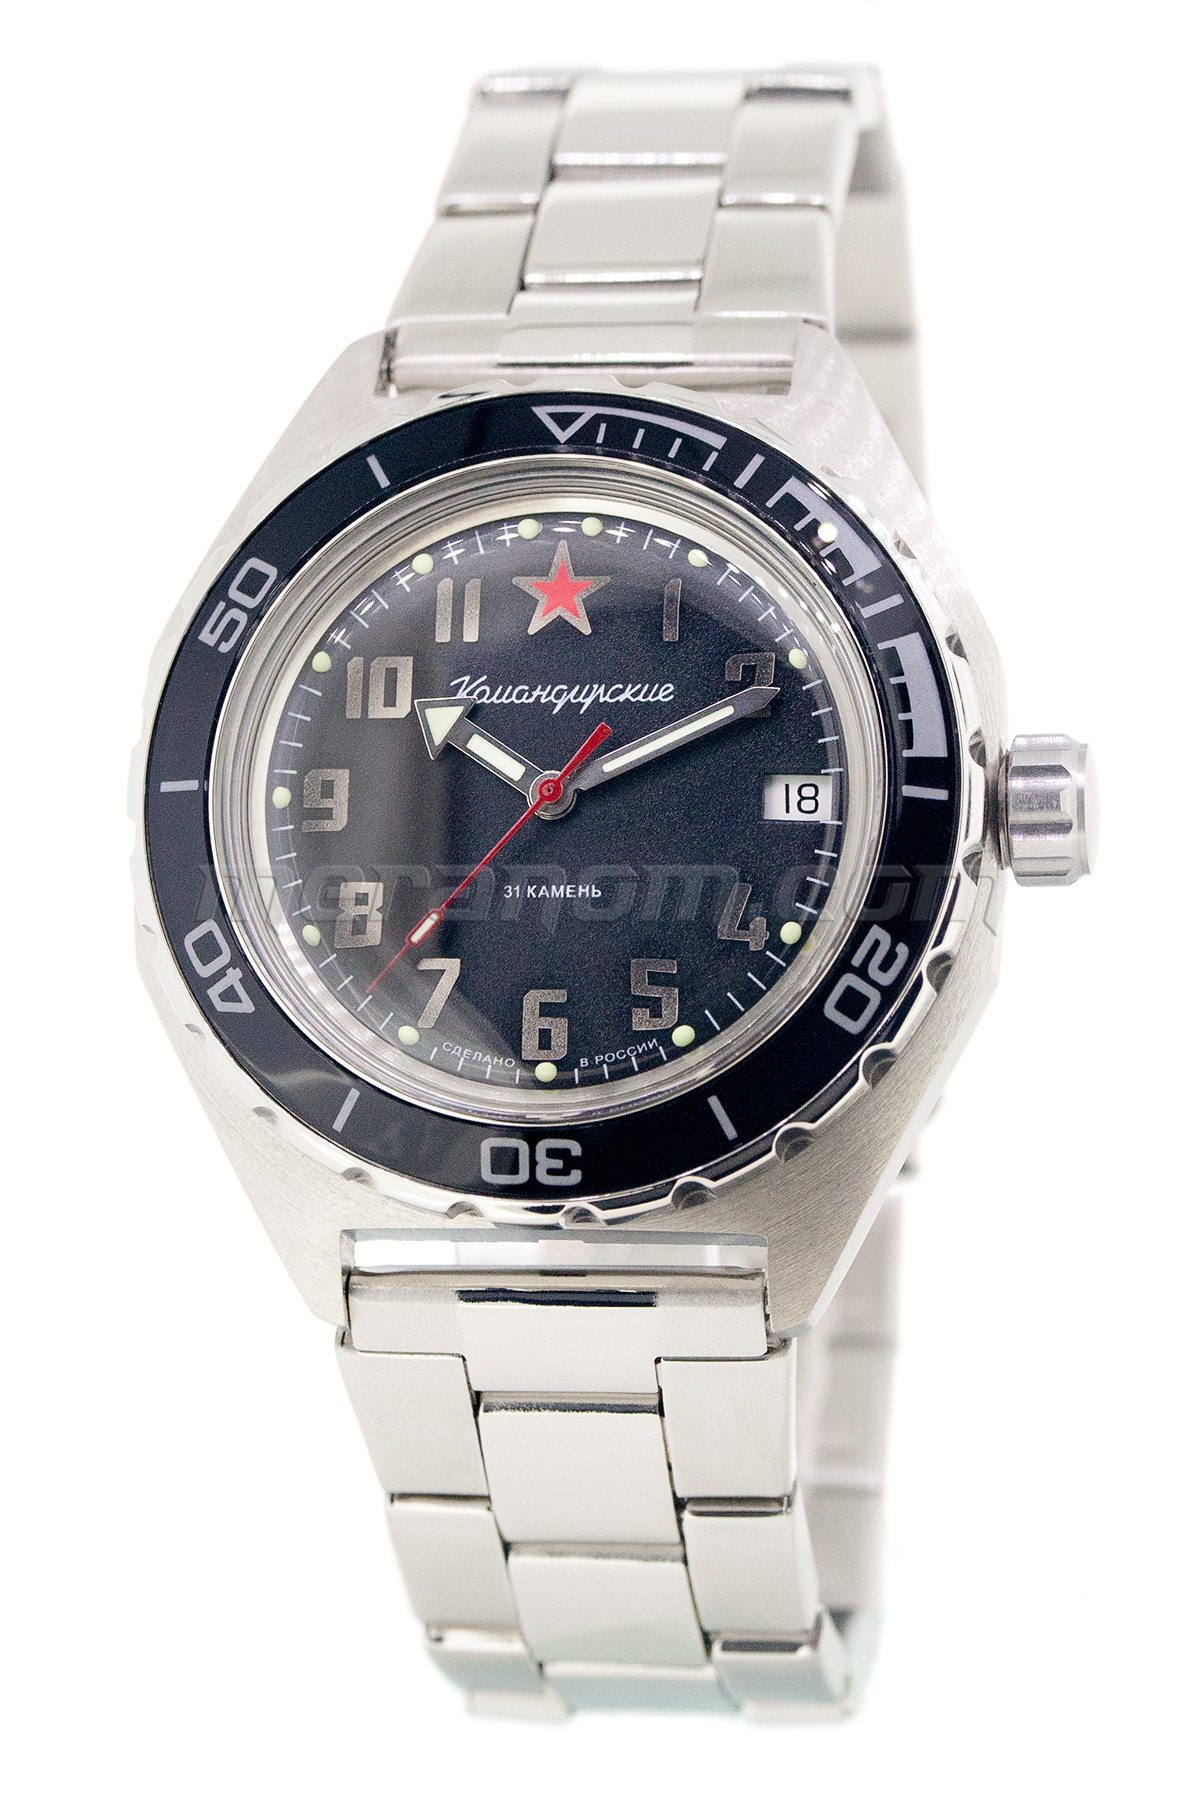 Vostok watch komandirskie 650537 buy from an authorized dealer for Komandirskie watches